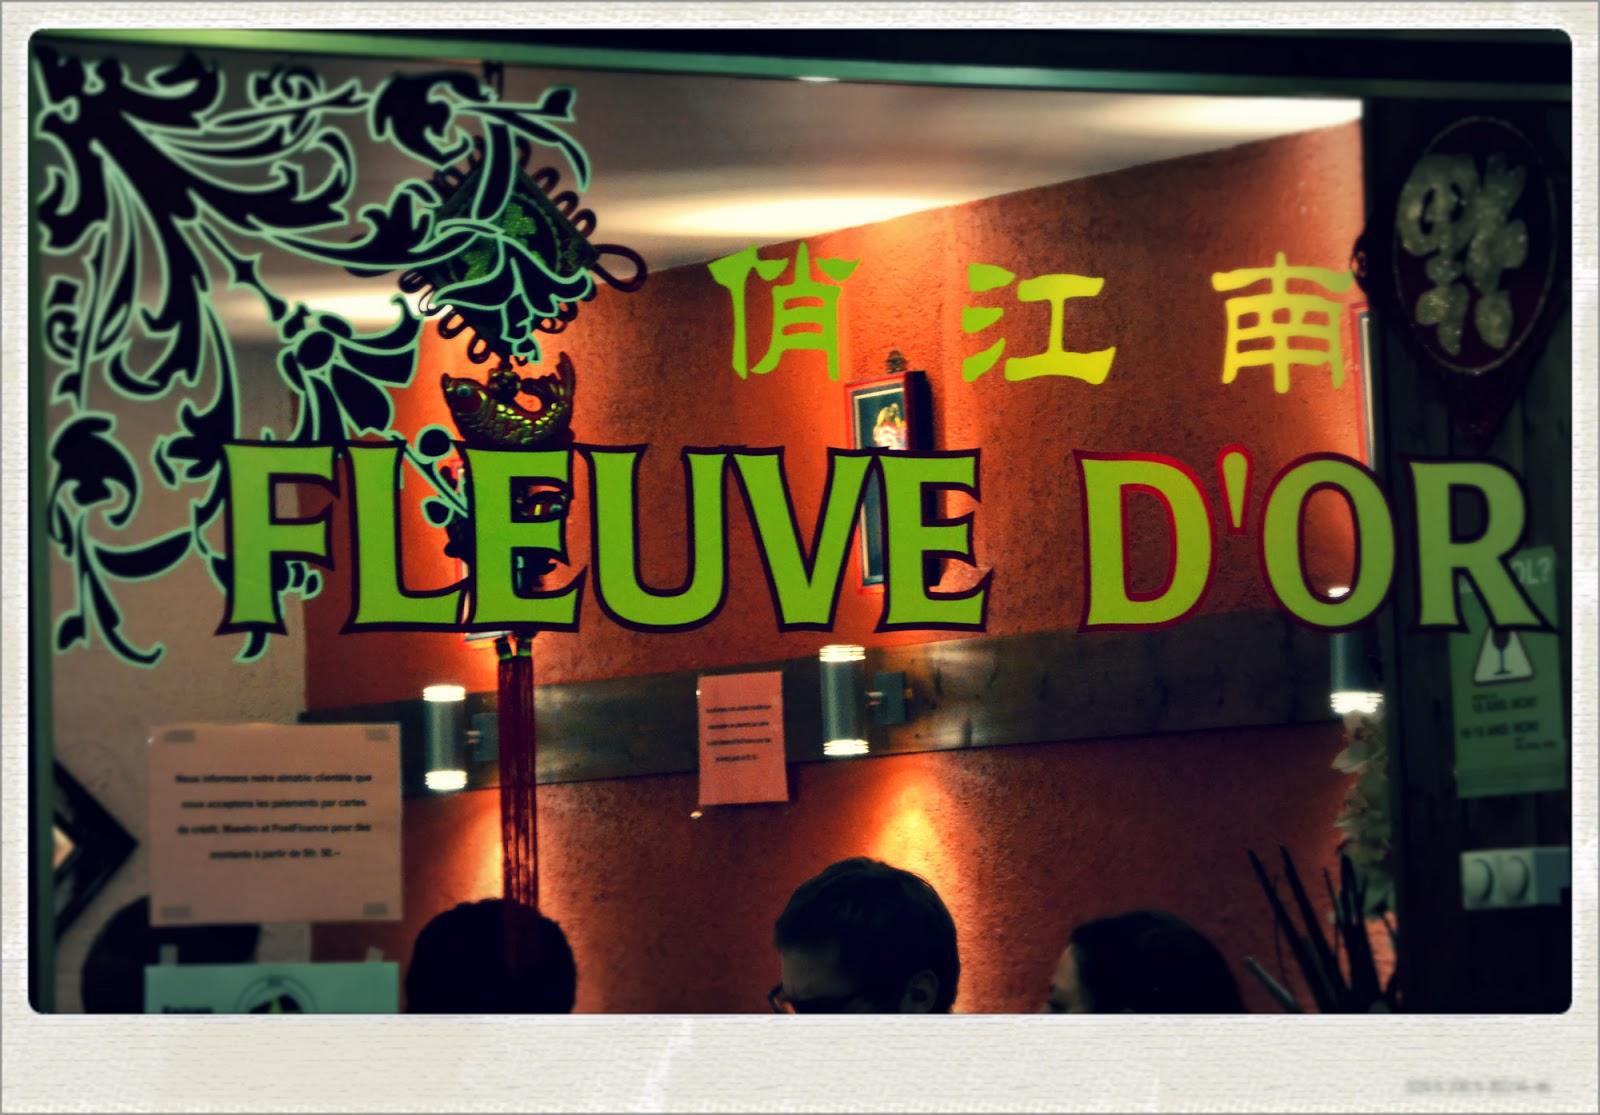 Meilleur Restaurant Asiatique Geneve